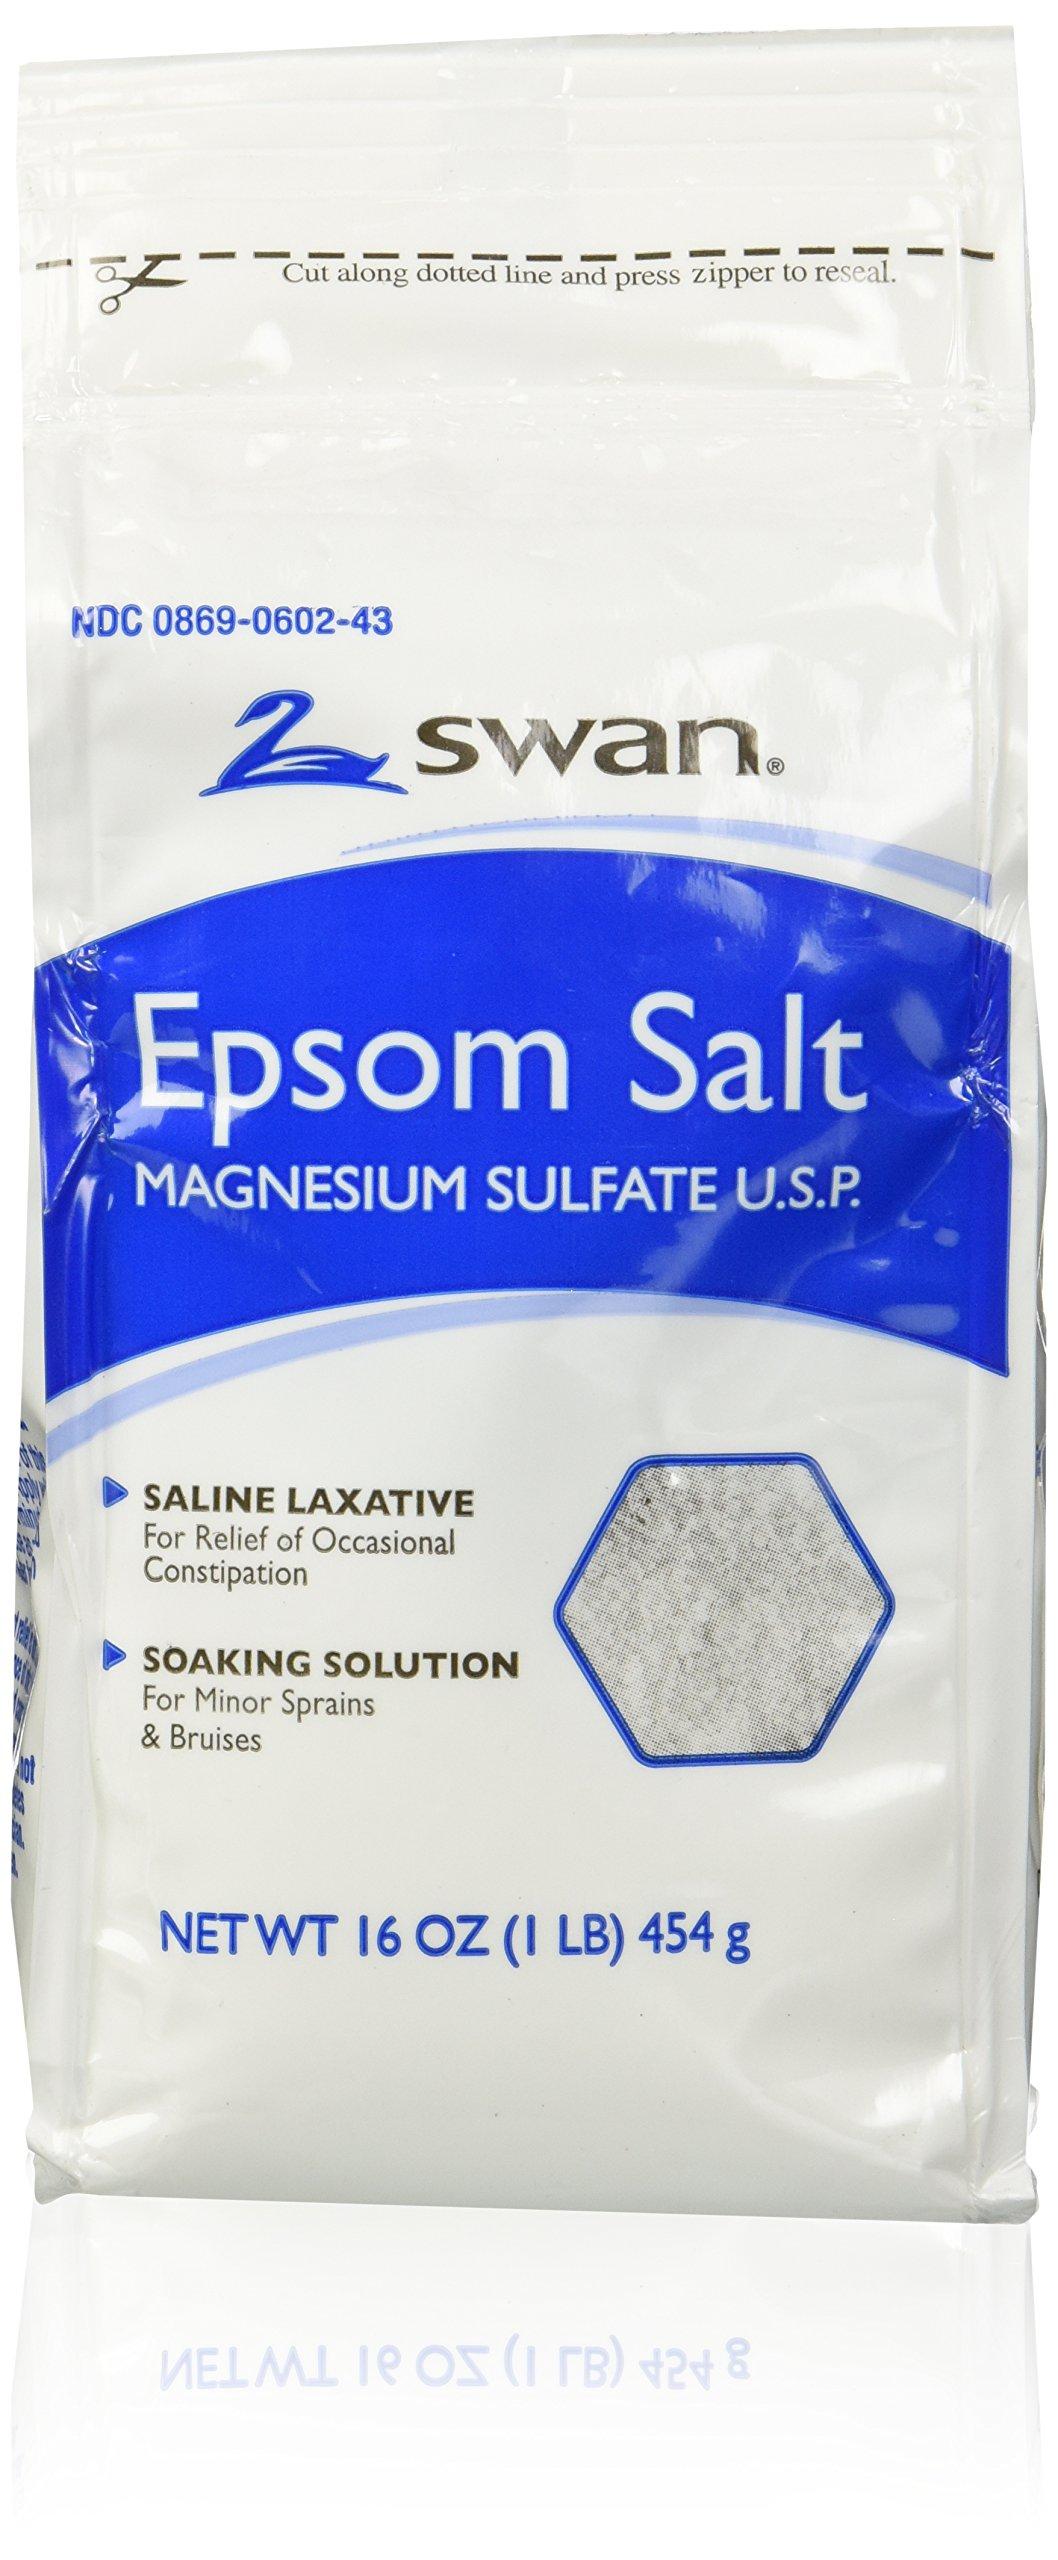 Swan Epsom Salt 16oz